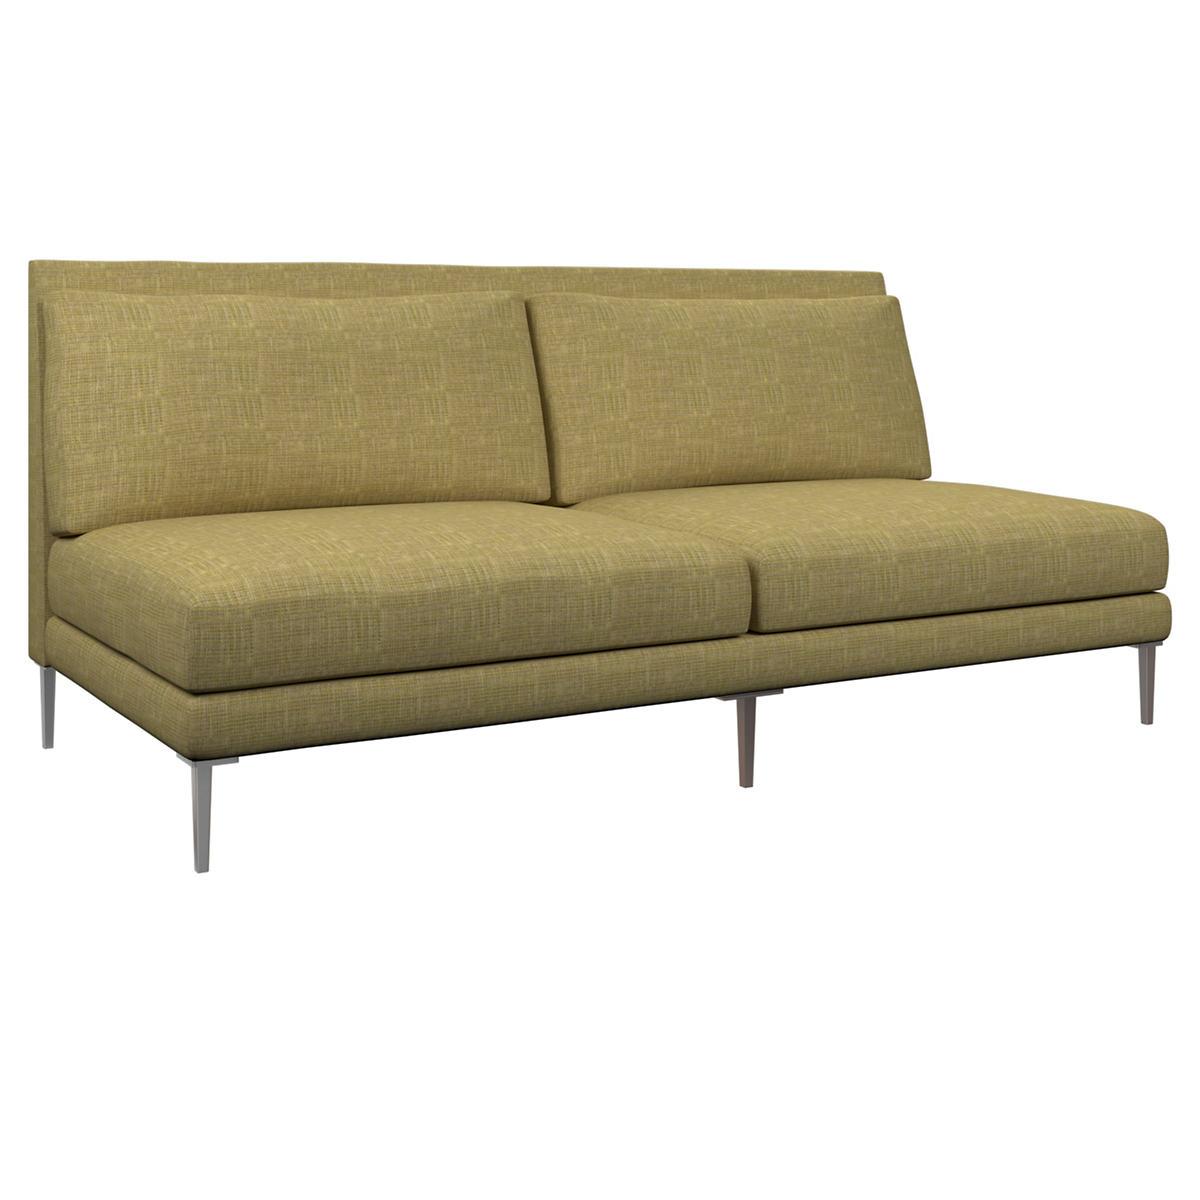 Heritage Chartreuse Portola Armless Sofa